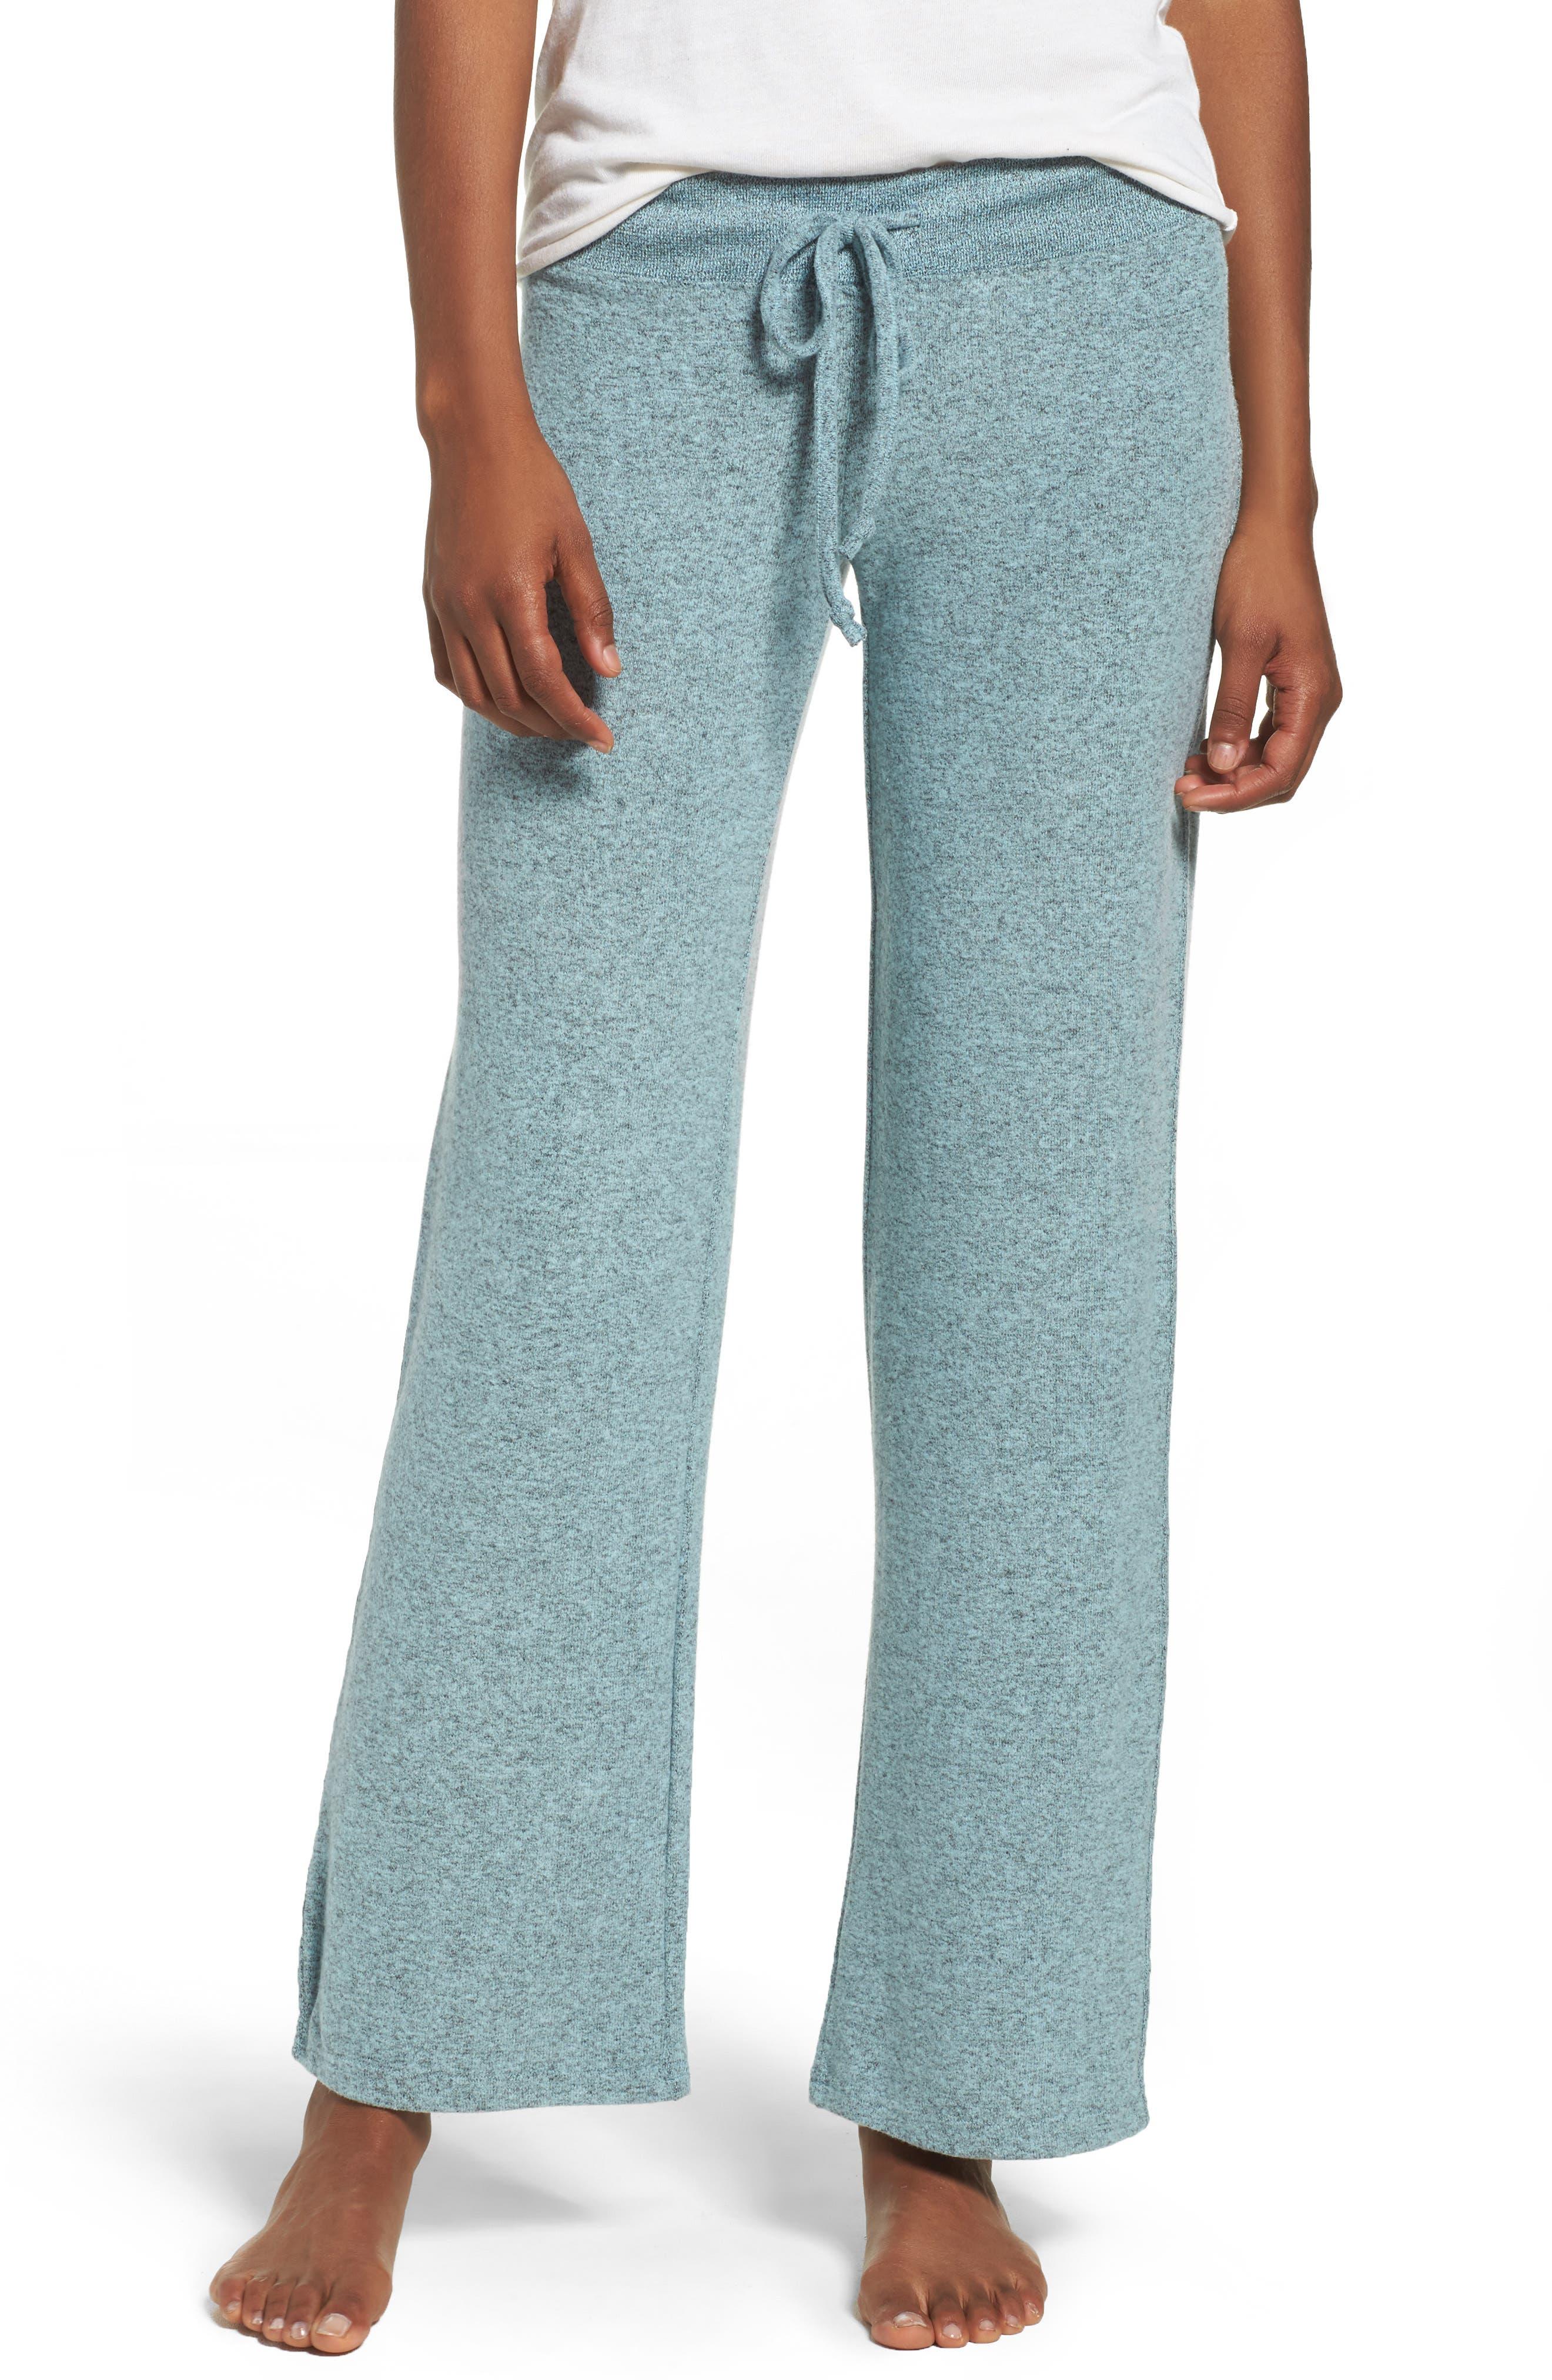 Alternate Image 1 Selected - Make + Model 'Best Boyfriend' Brushed Hacci Lounge Pants